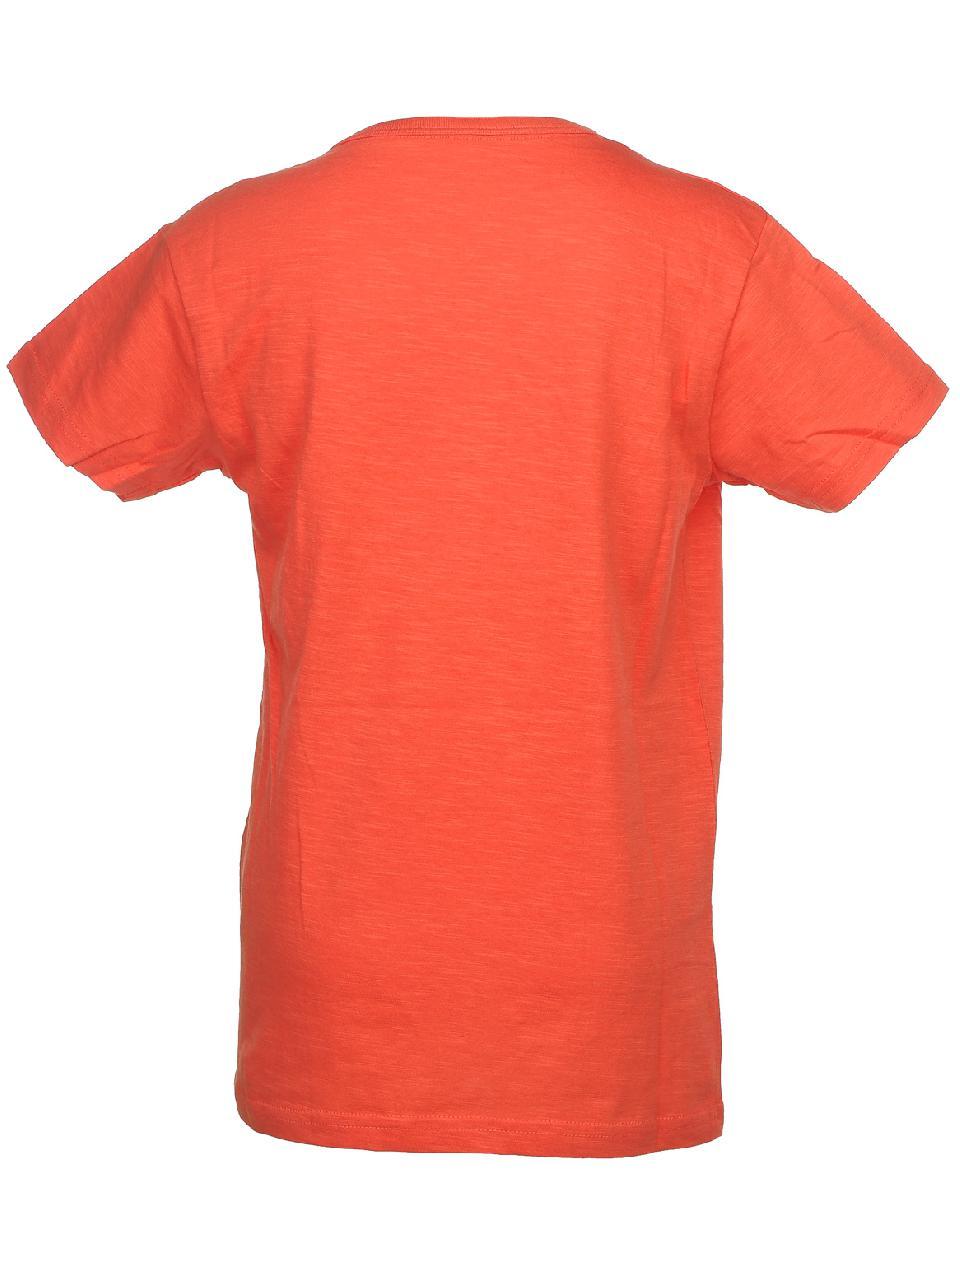 Tee-shirt-manches-courtes-Biaggio-Lorikel-corail-mc-tee-jr-Orange-58545-Neuf